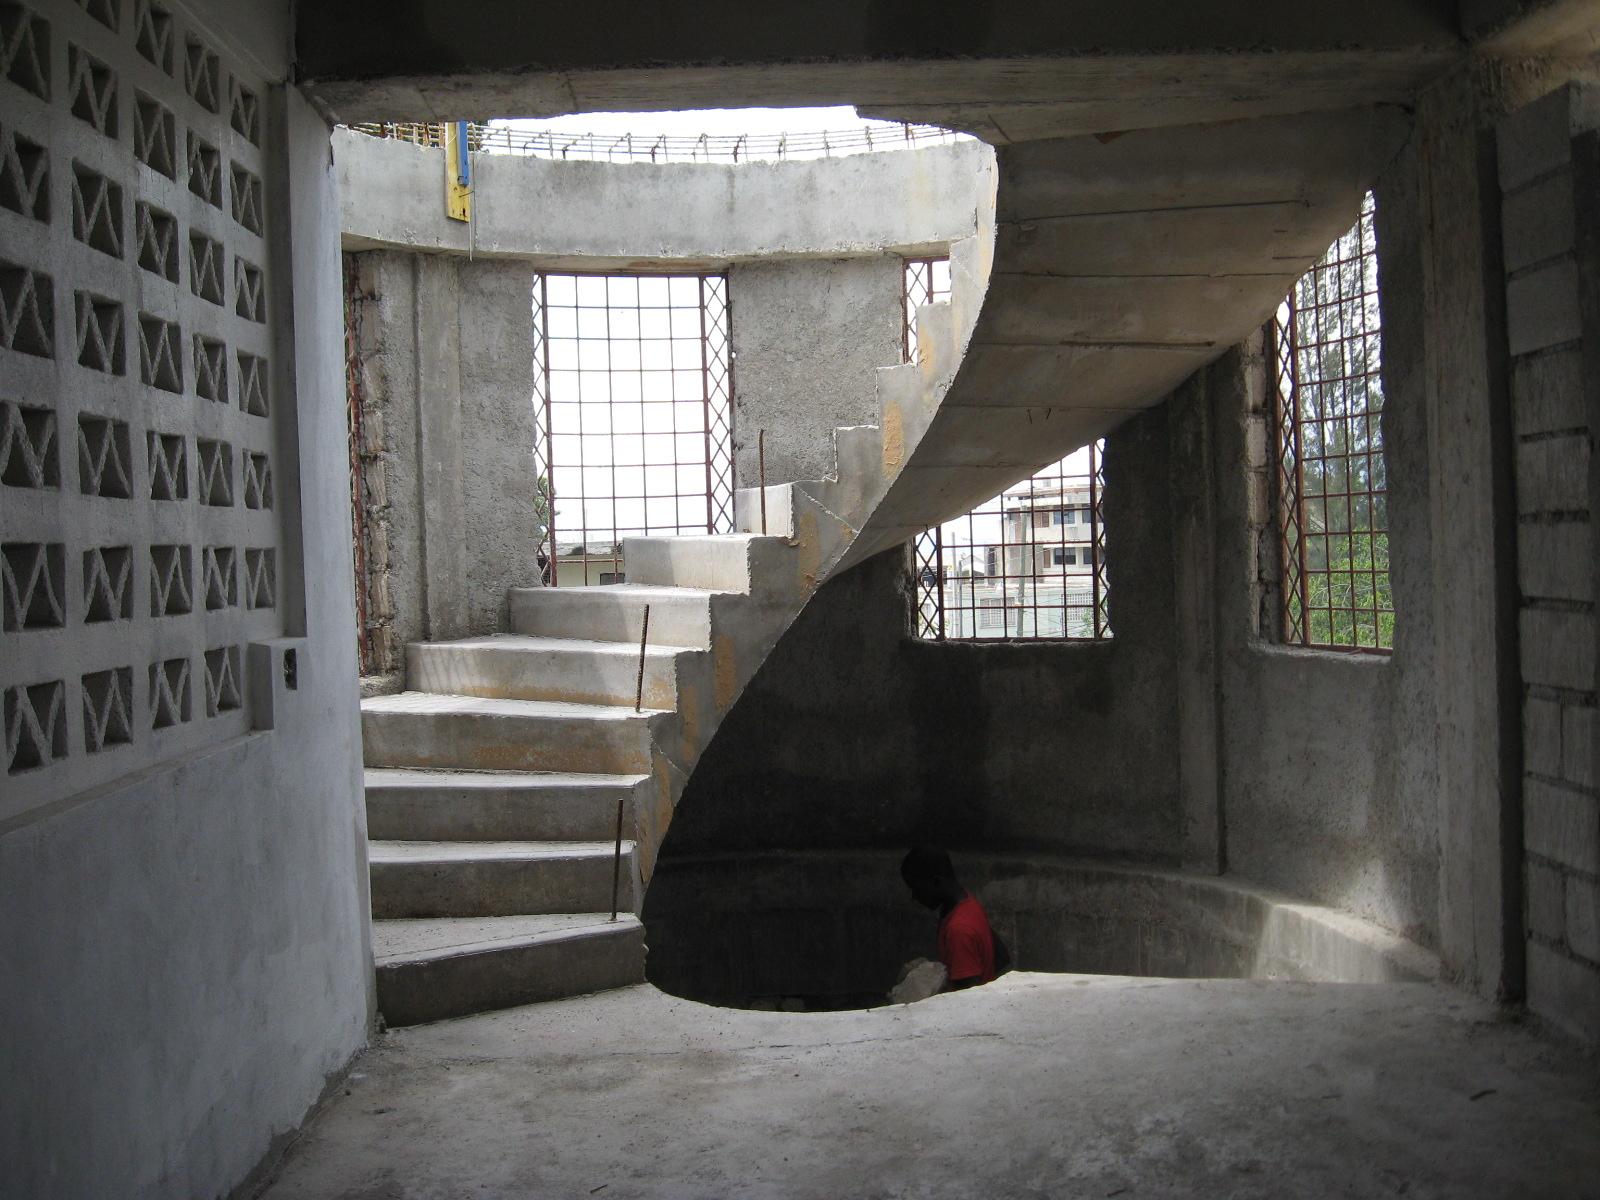 Escalier b ton sur trois tages pictures to pin on pinterest - Escalier colimacon beton ...